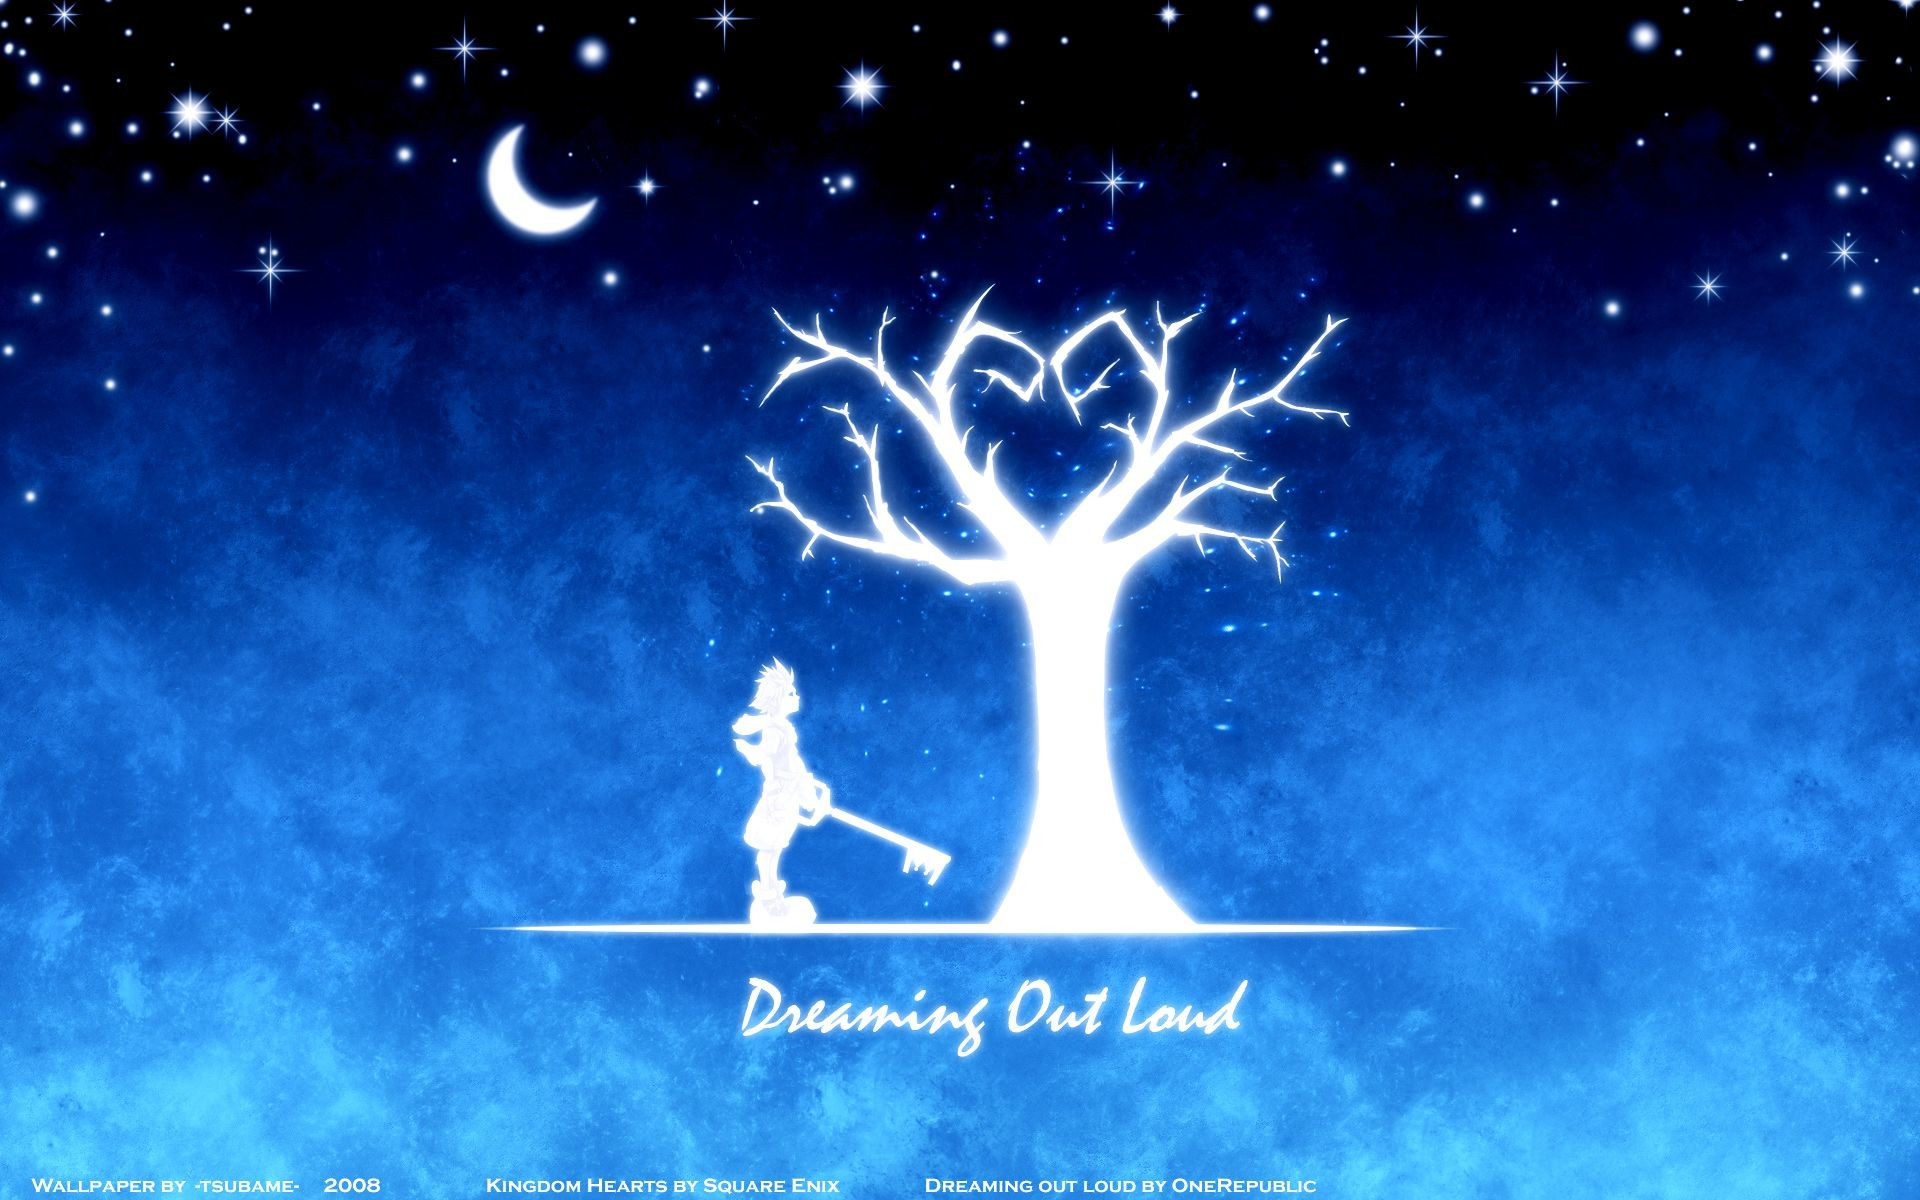 Kingdom hearts wallpaper iphone – Kingdom Hearts Wallpaper Hd